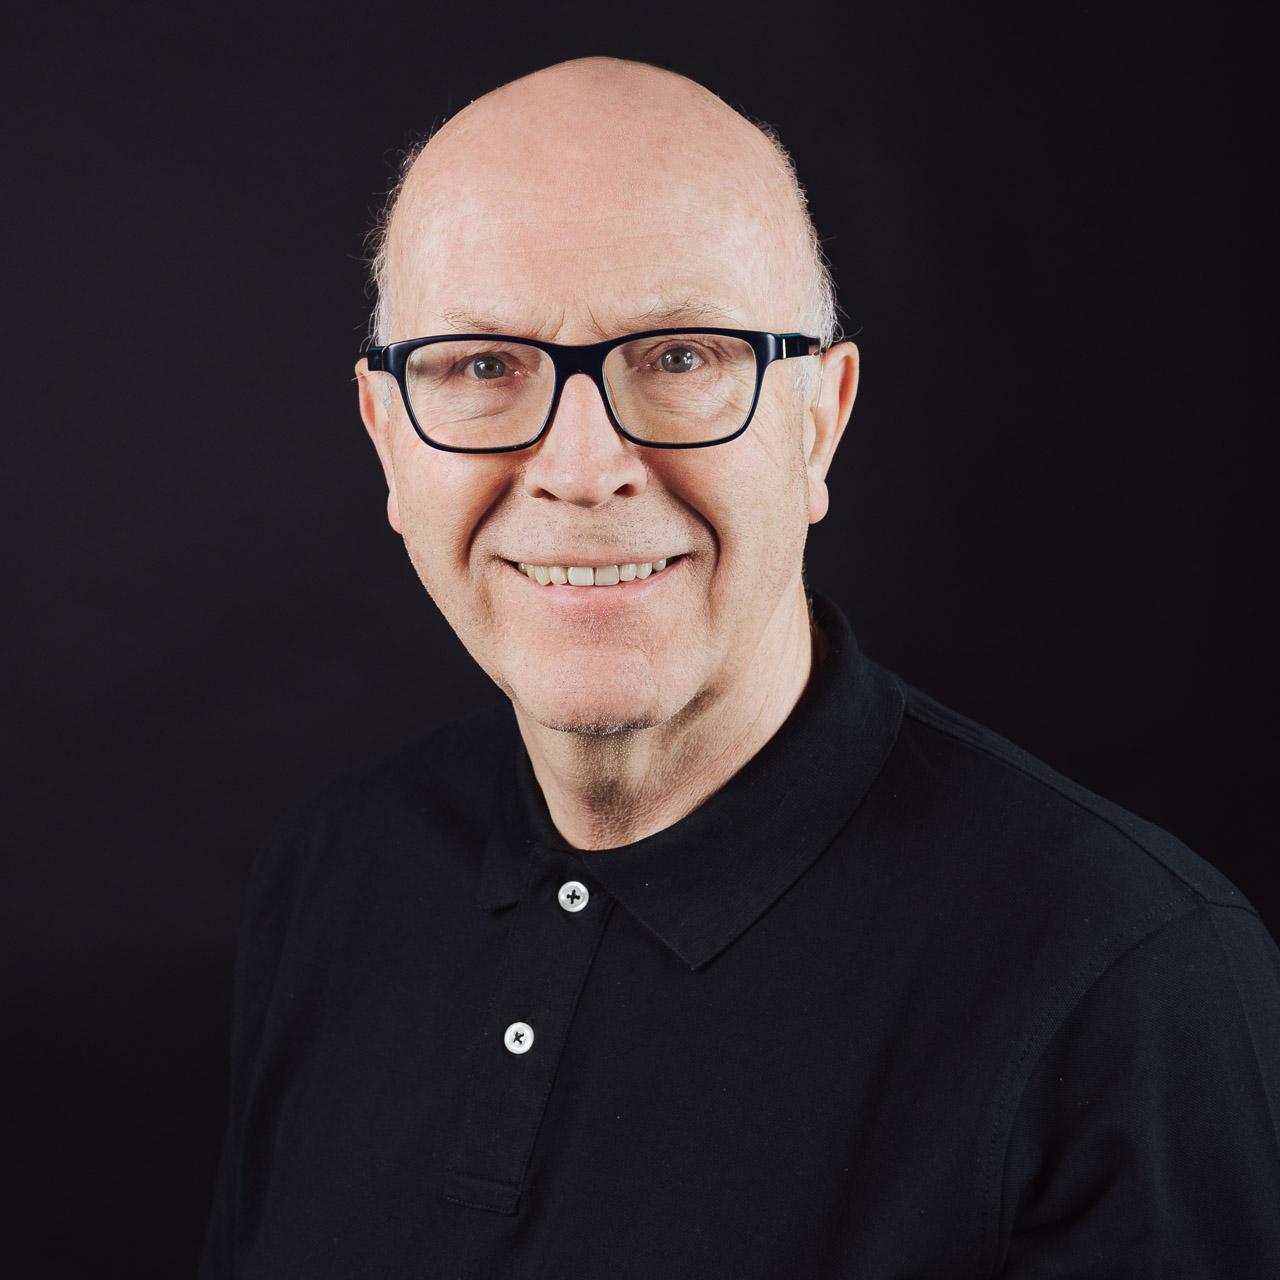 Portret van Carino Sunderman, oprichter van Sunwood